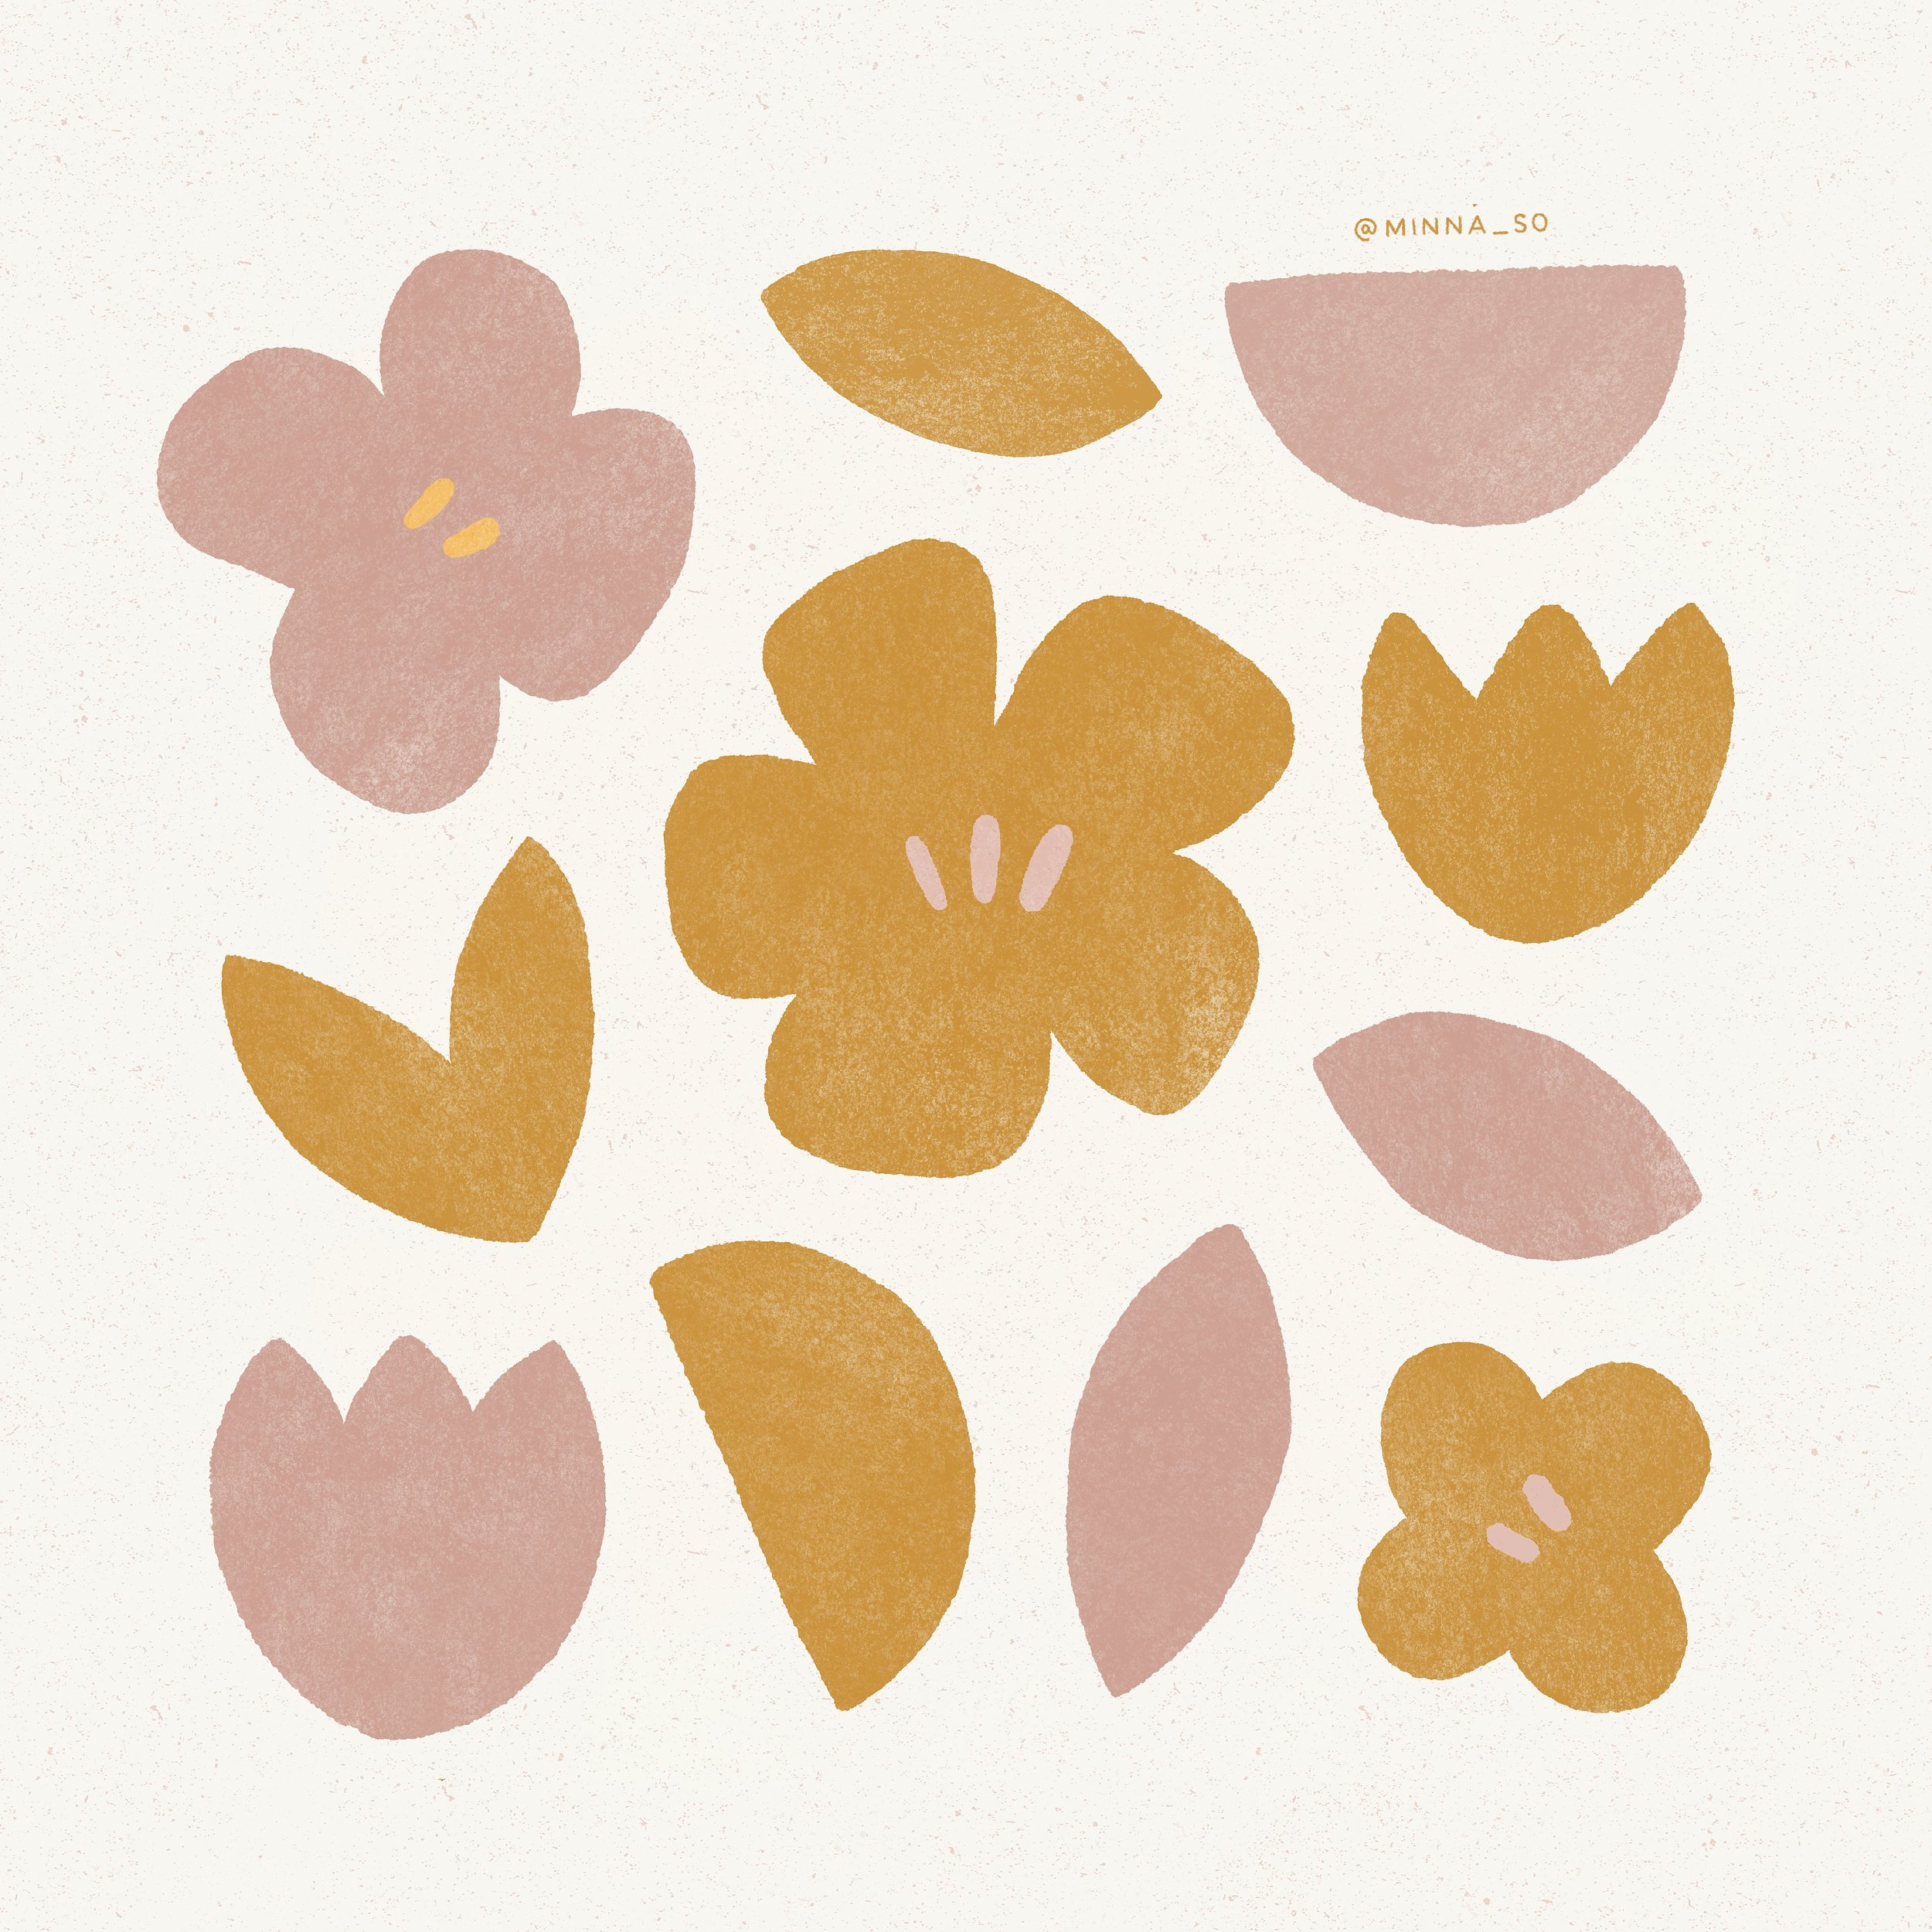 floral illustration by minna so